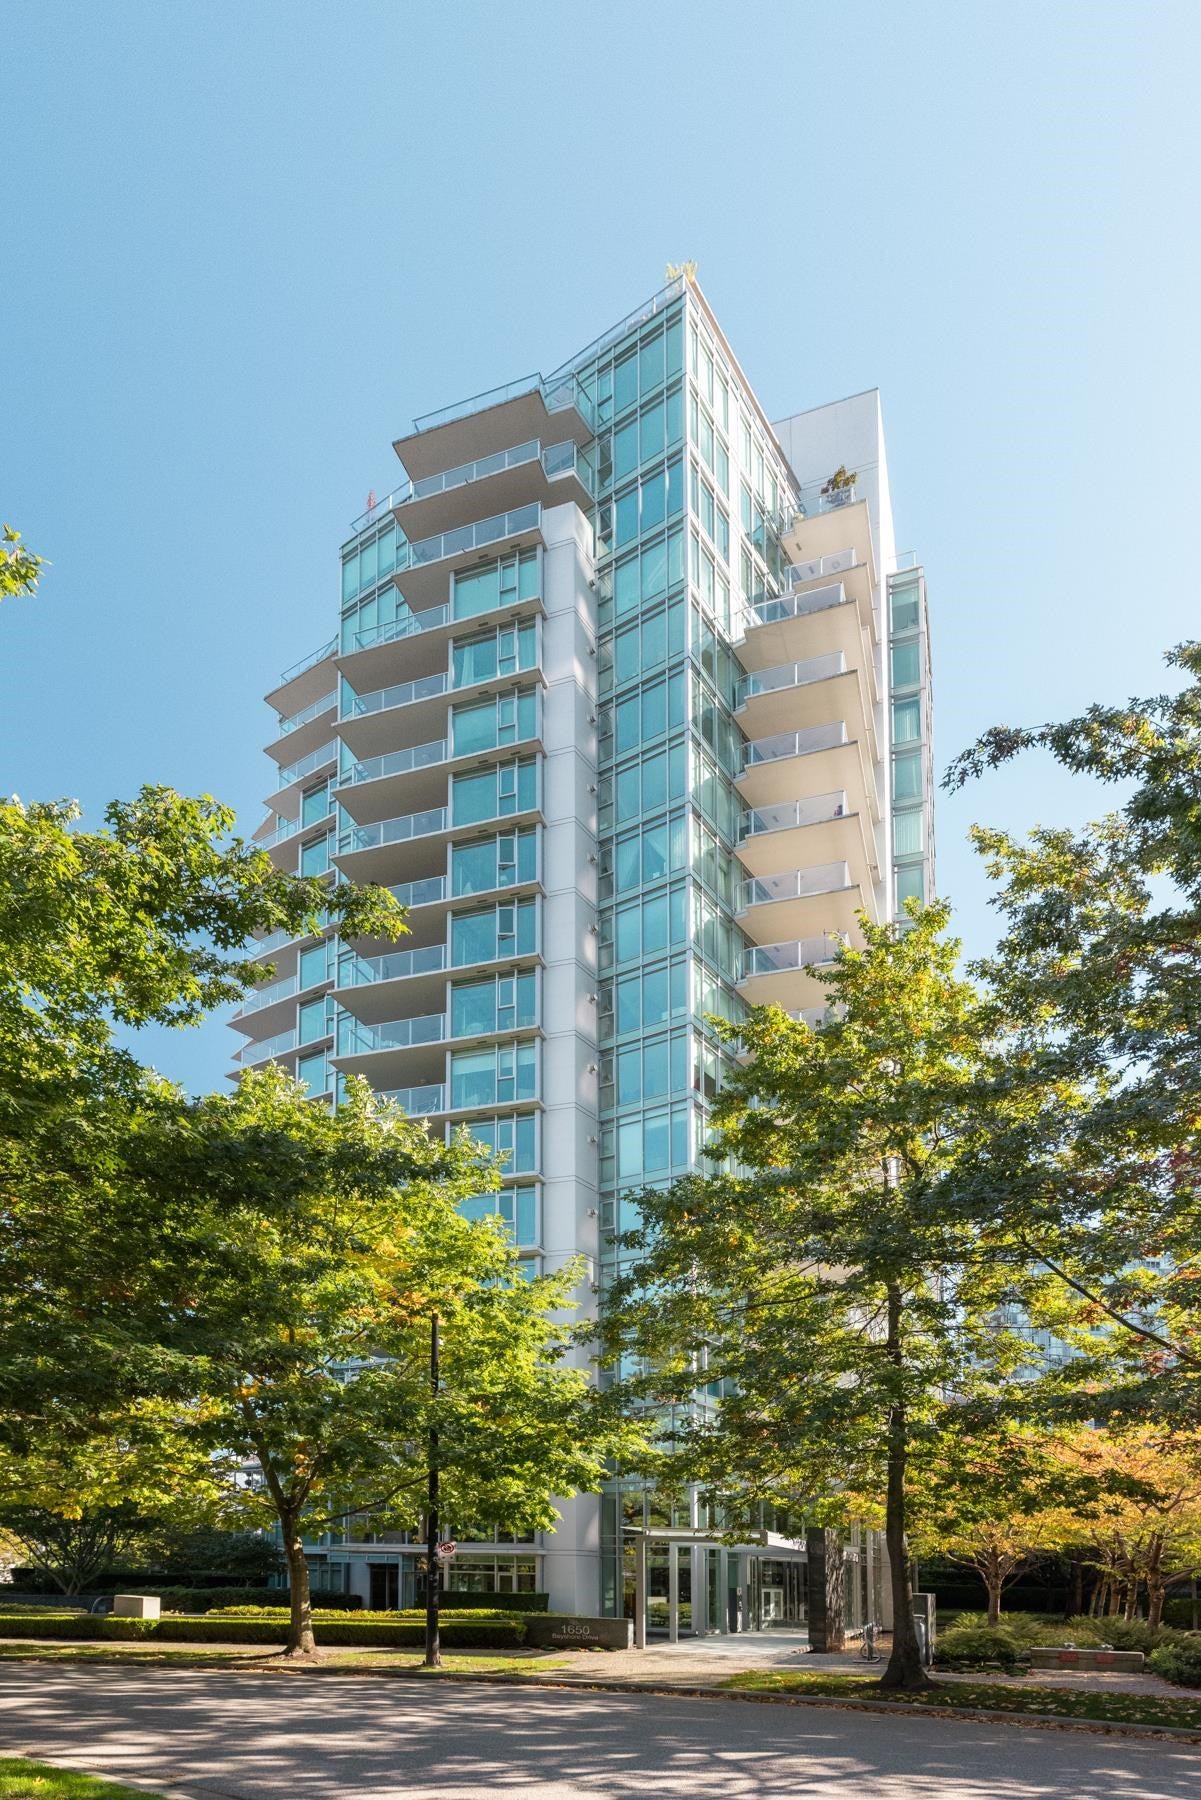 404 1650 BAYSHORE DRIVE - Coal Harbour Apartment/Condo for sale, 2 Bedrooms (R2626262)